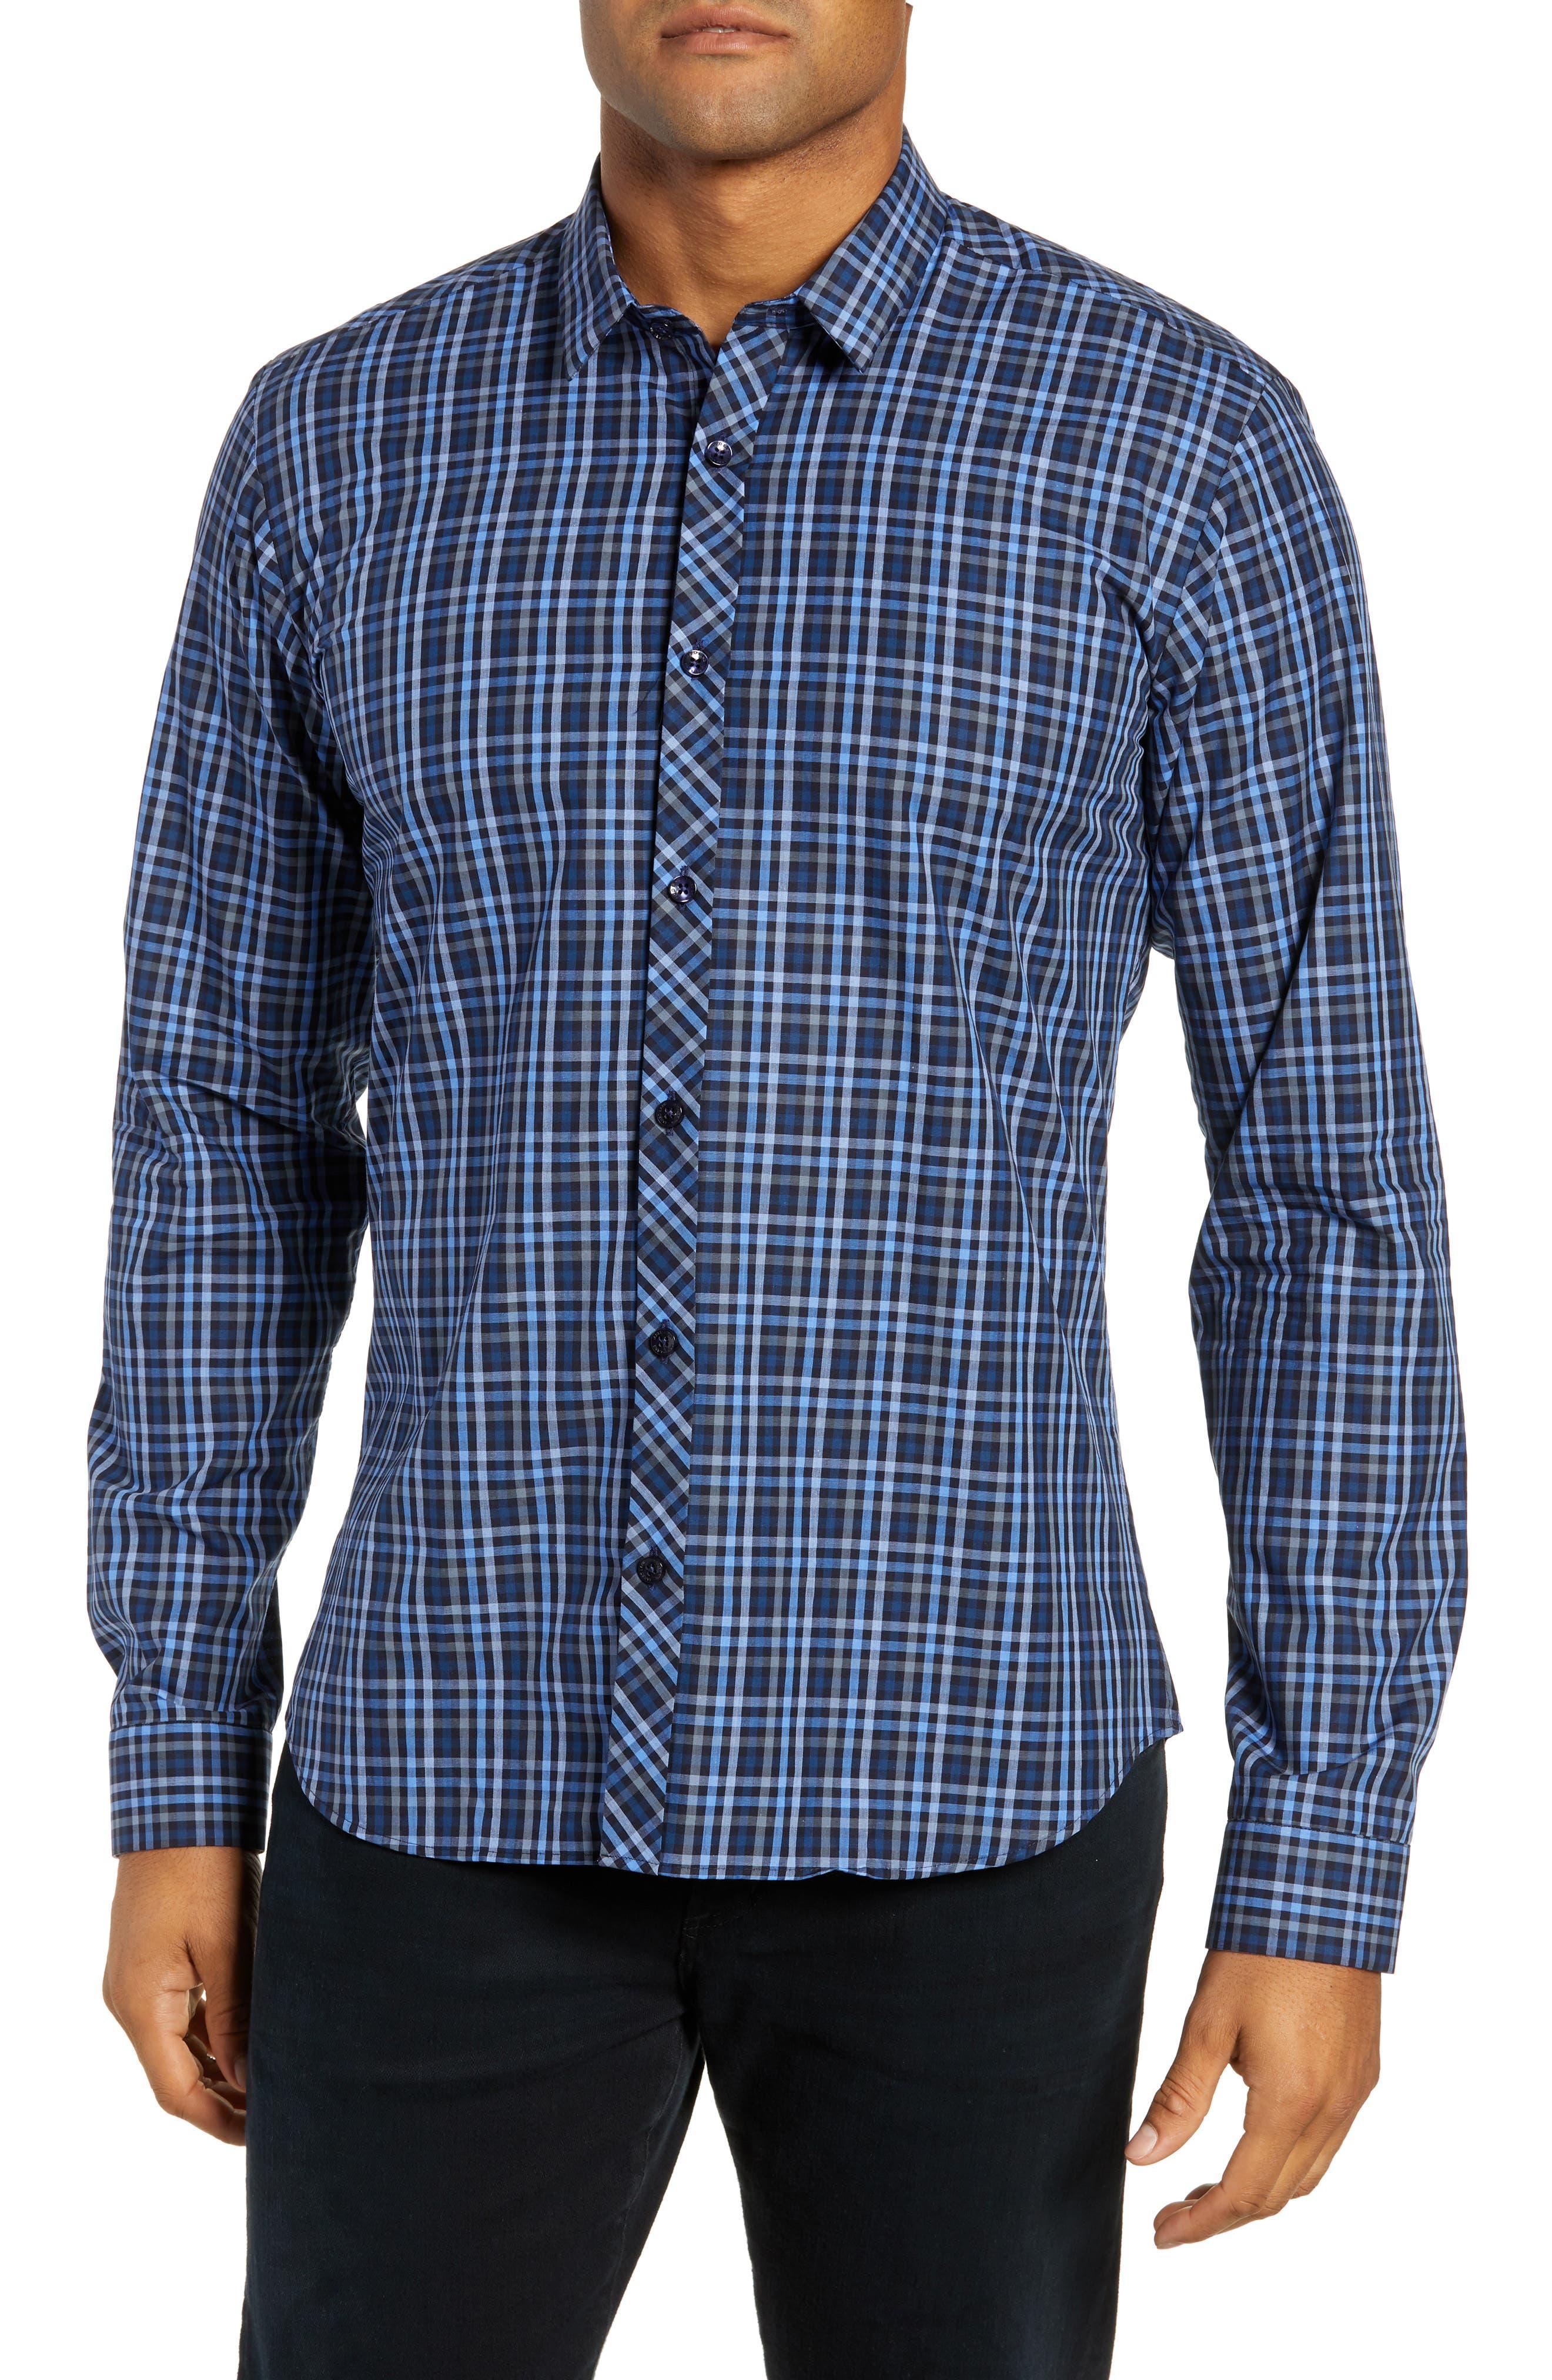 Trim Fit Sport Shirt,                         Main,                         color, NAVY - BLUE MULTI CHECK